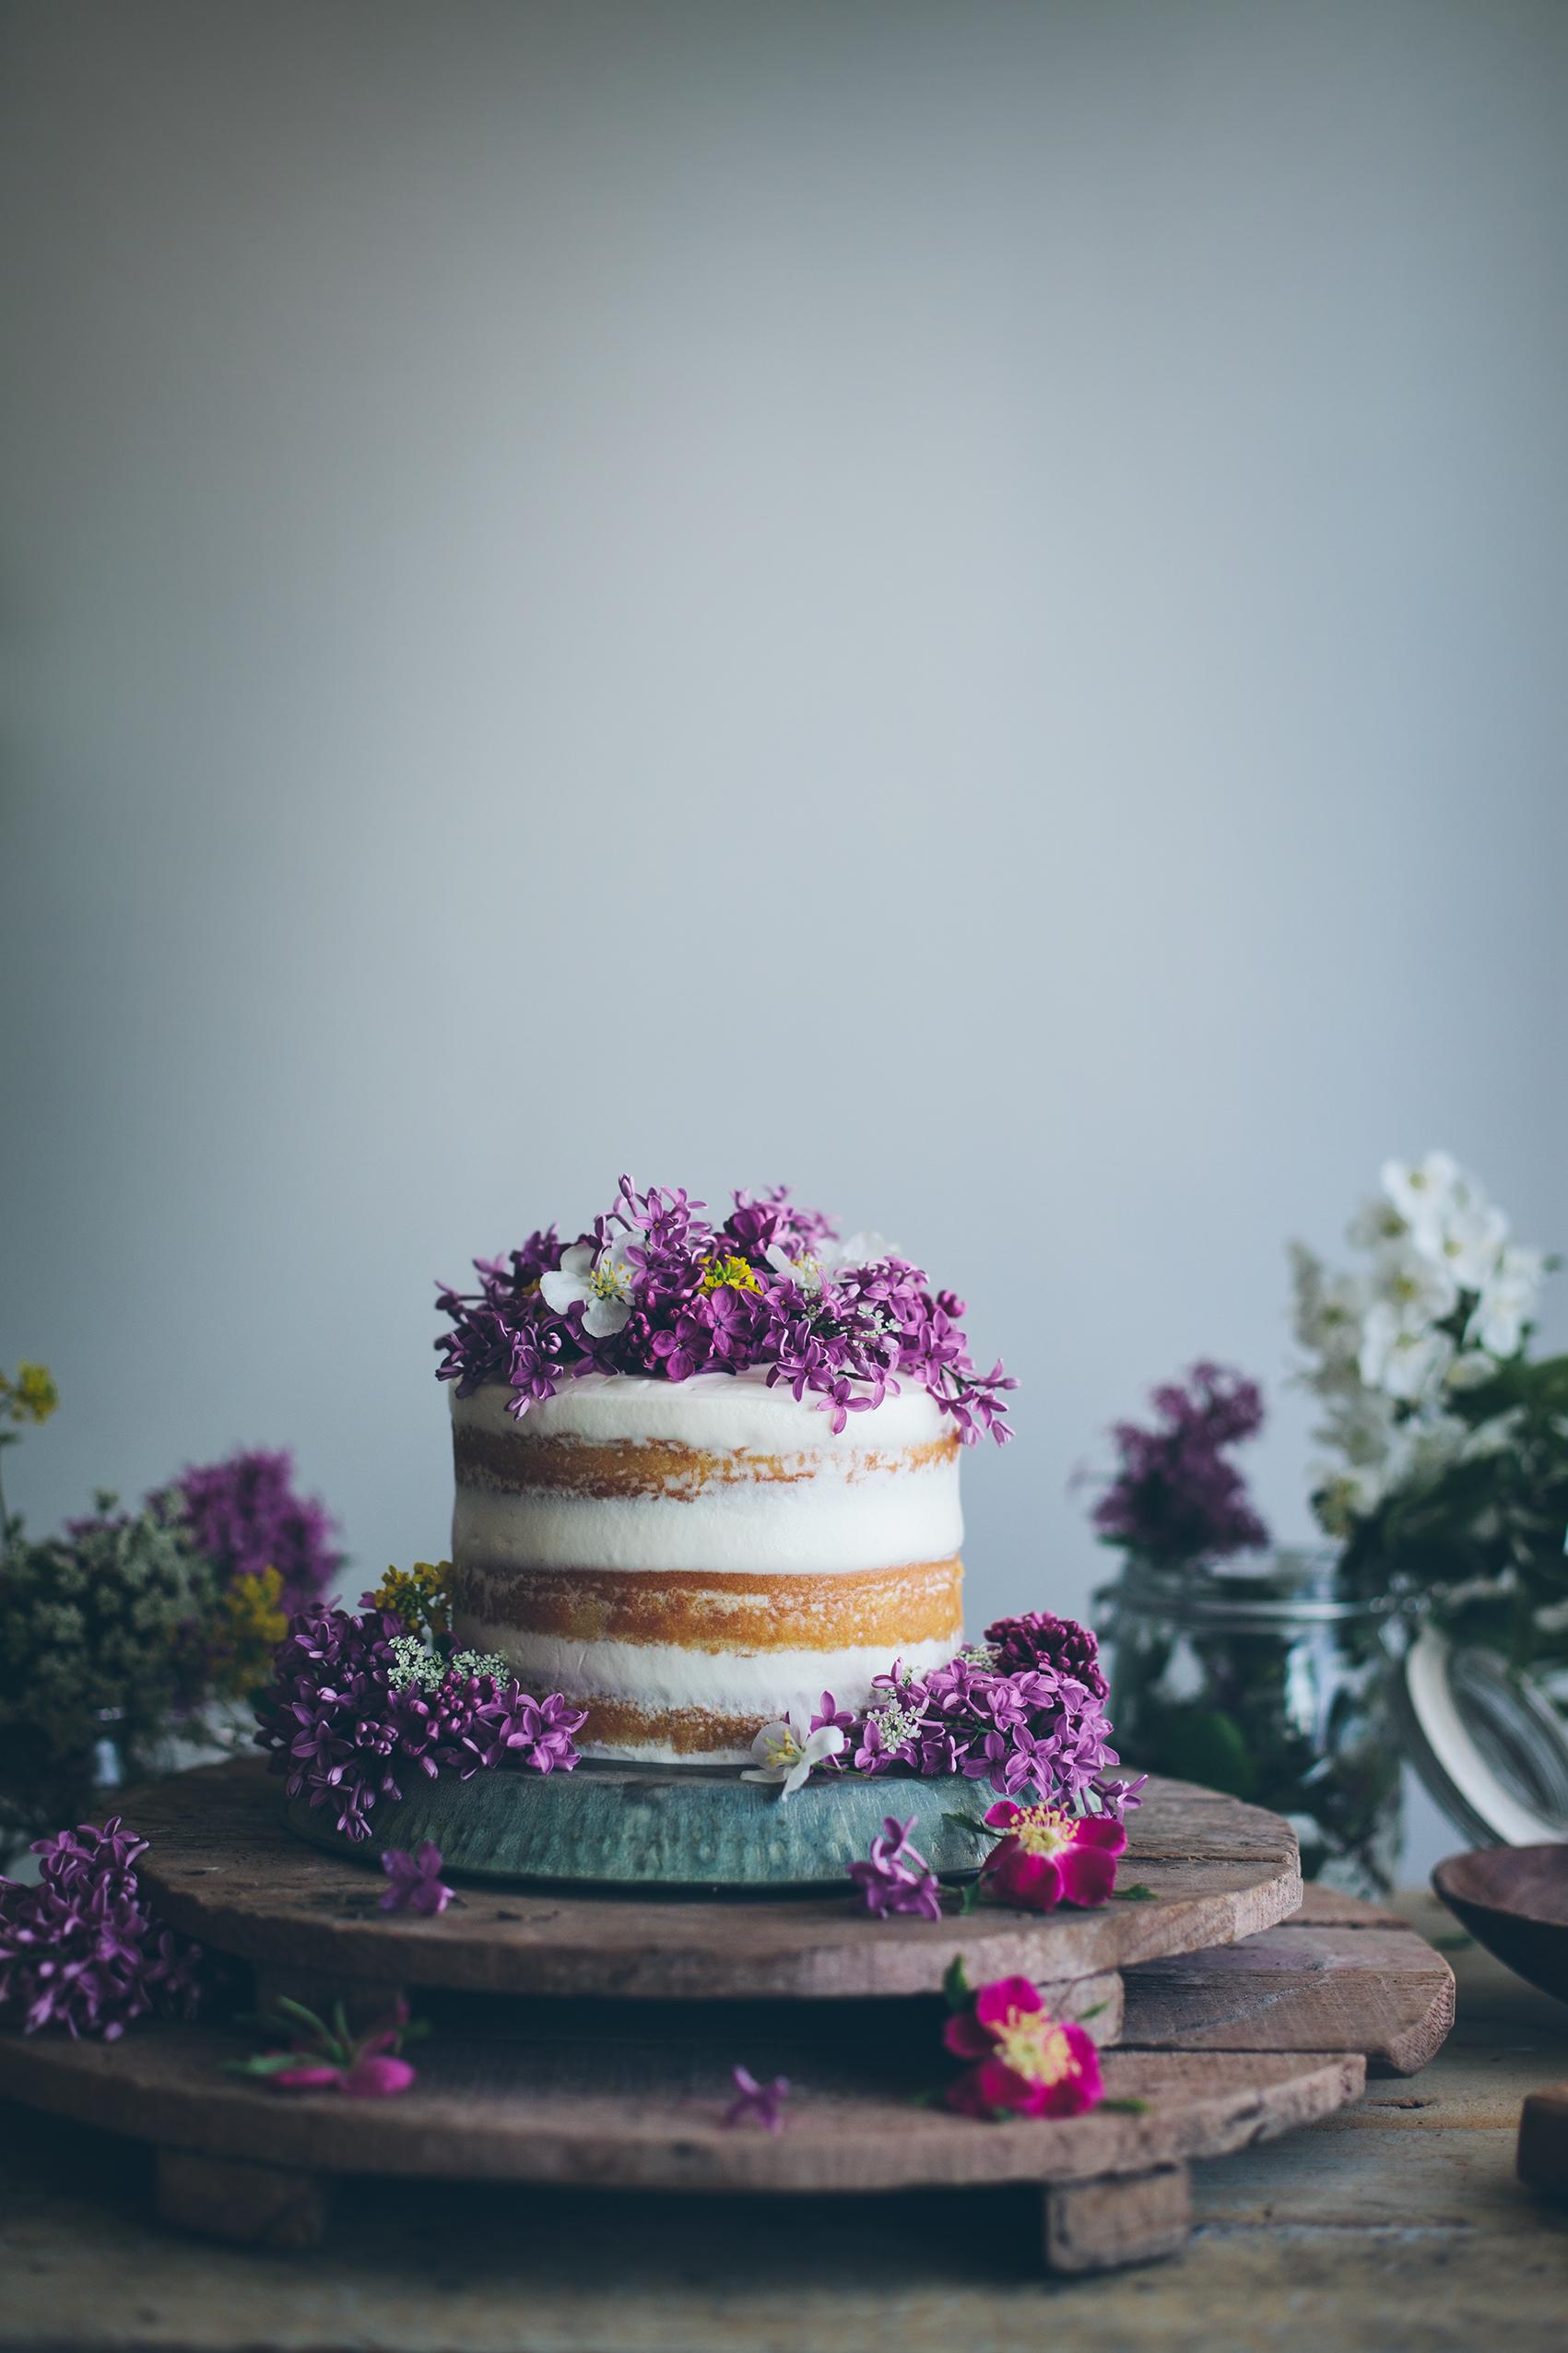 Naked Cake by Linda Lomelino | Erin Gardner | Bluprint